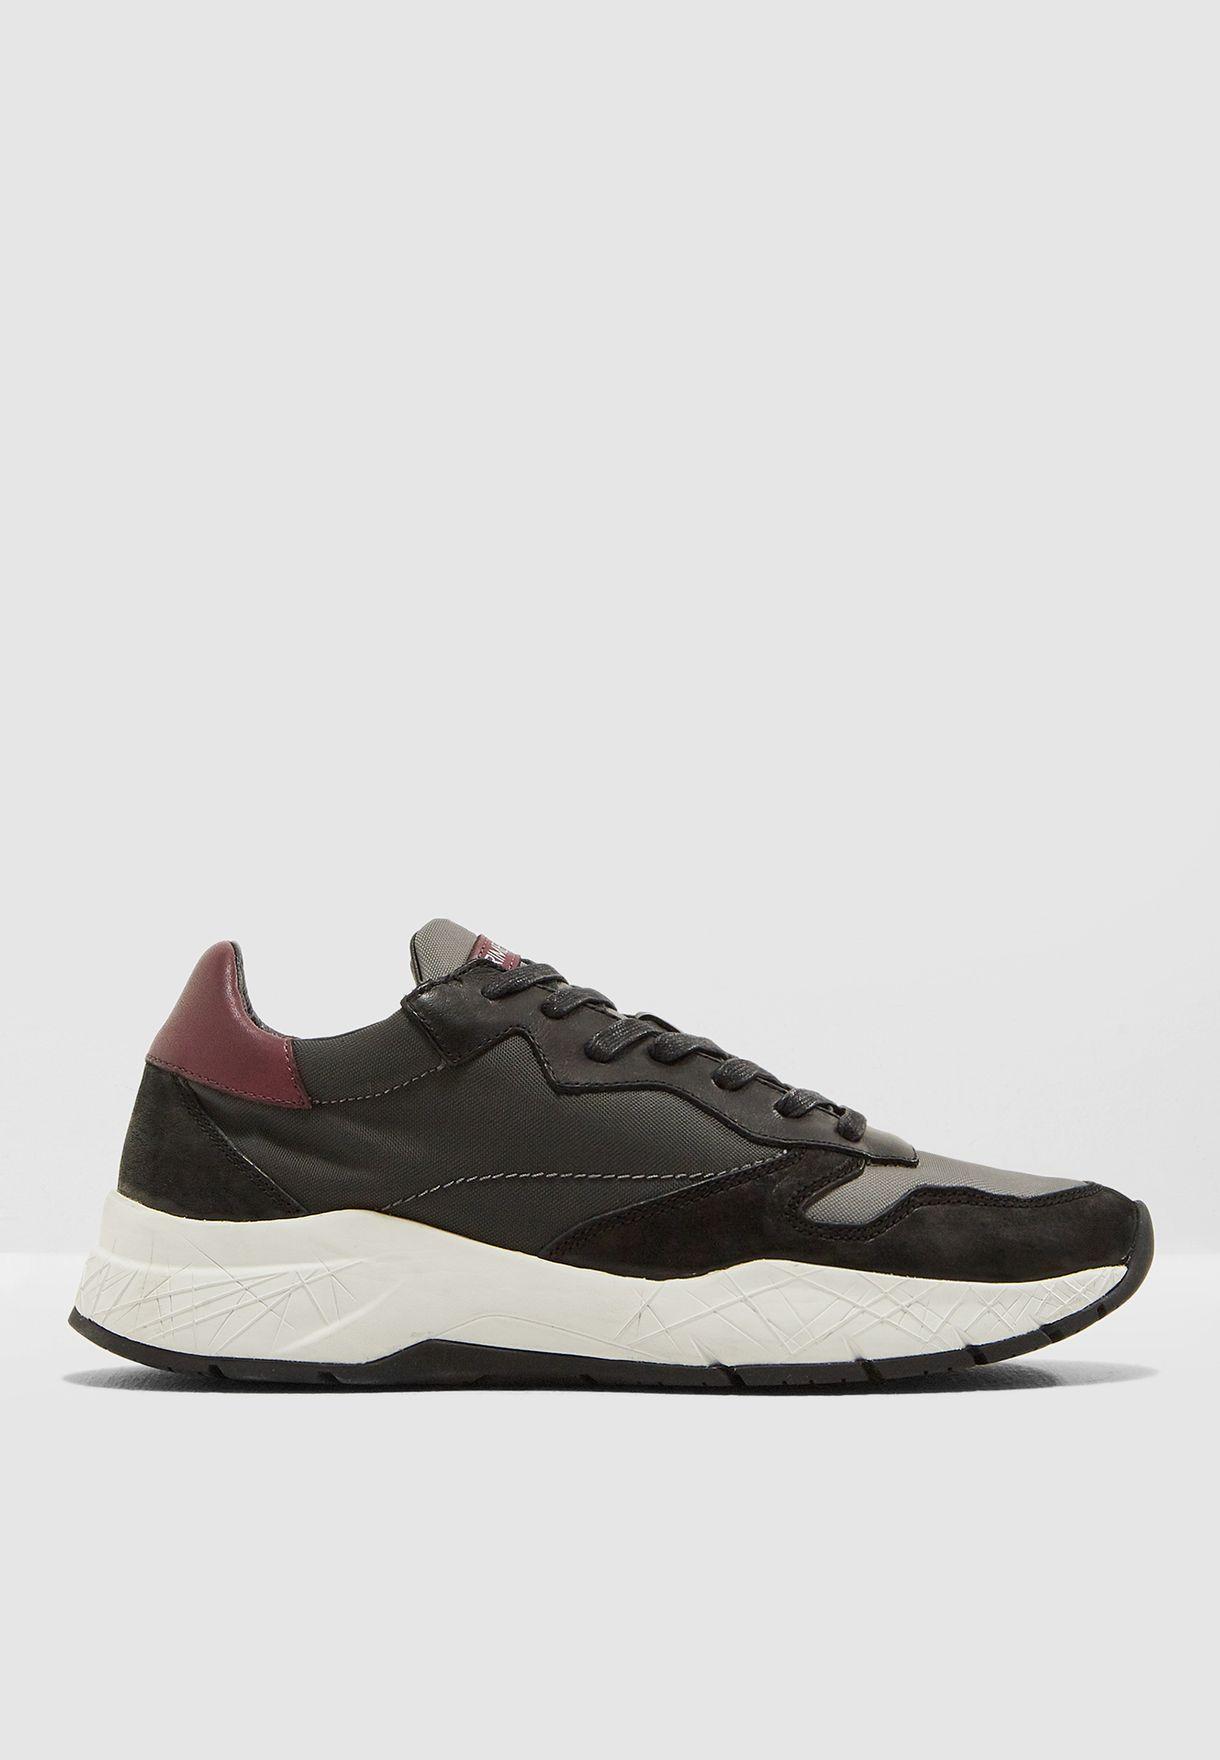 Fuse Sneakers